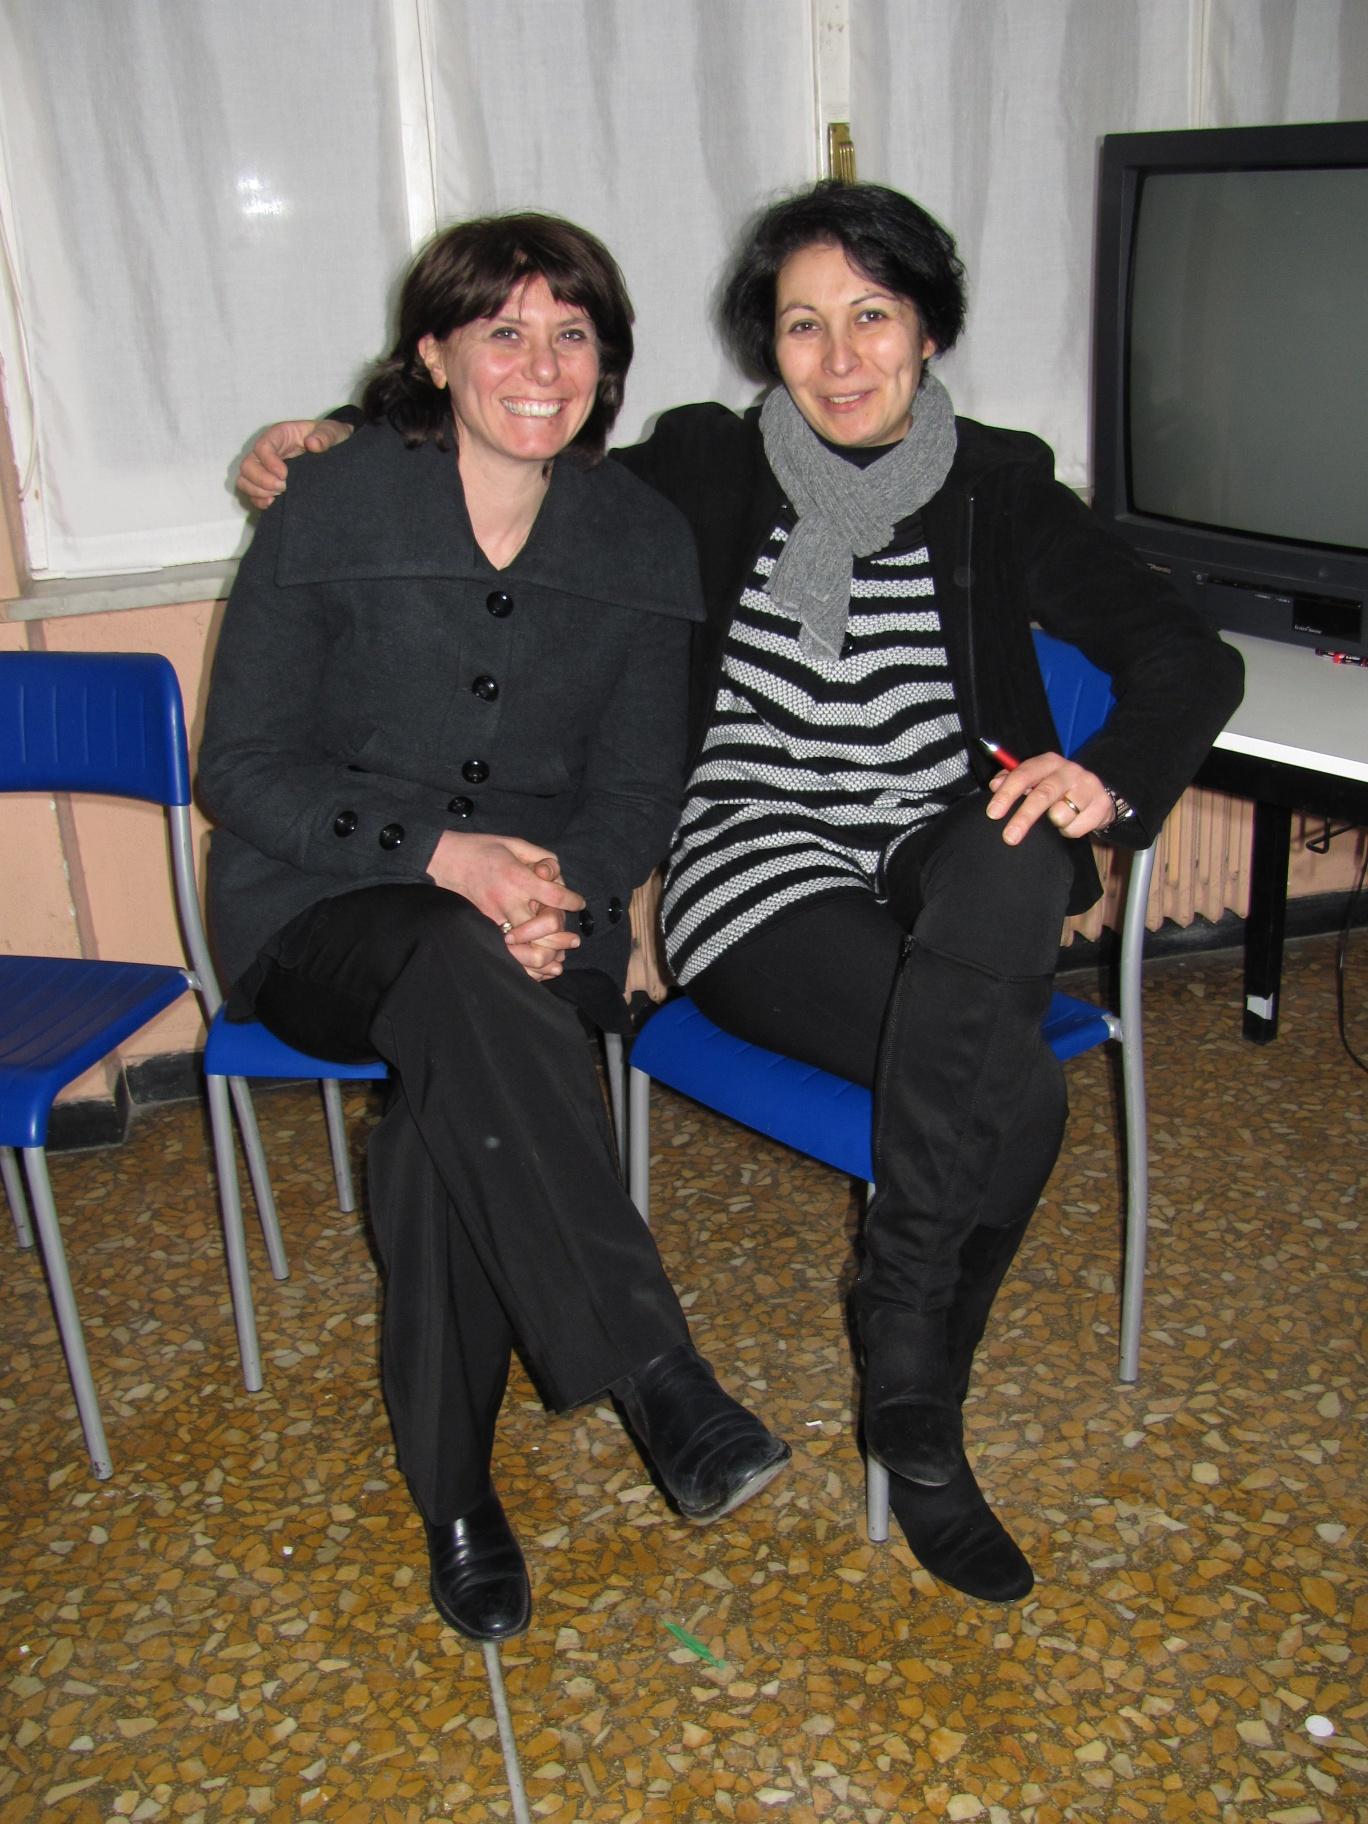 ricordo_battesimo_gesu_2011-01-23-17-42-31